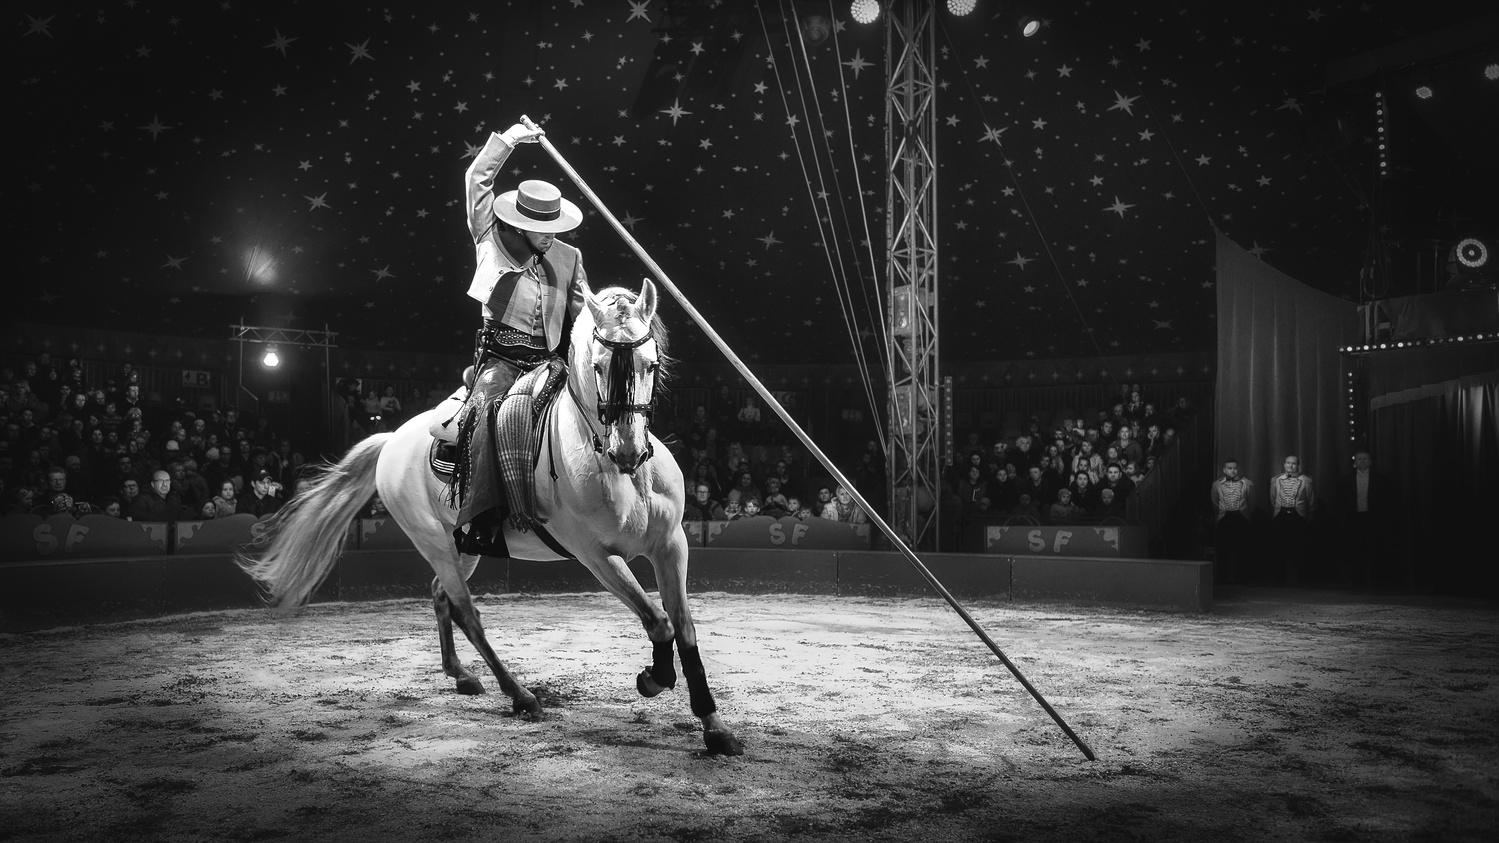 The Circus Artist by Carl Irjala